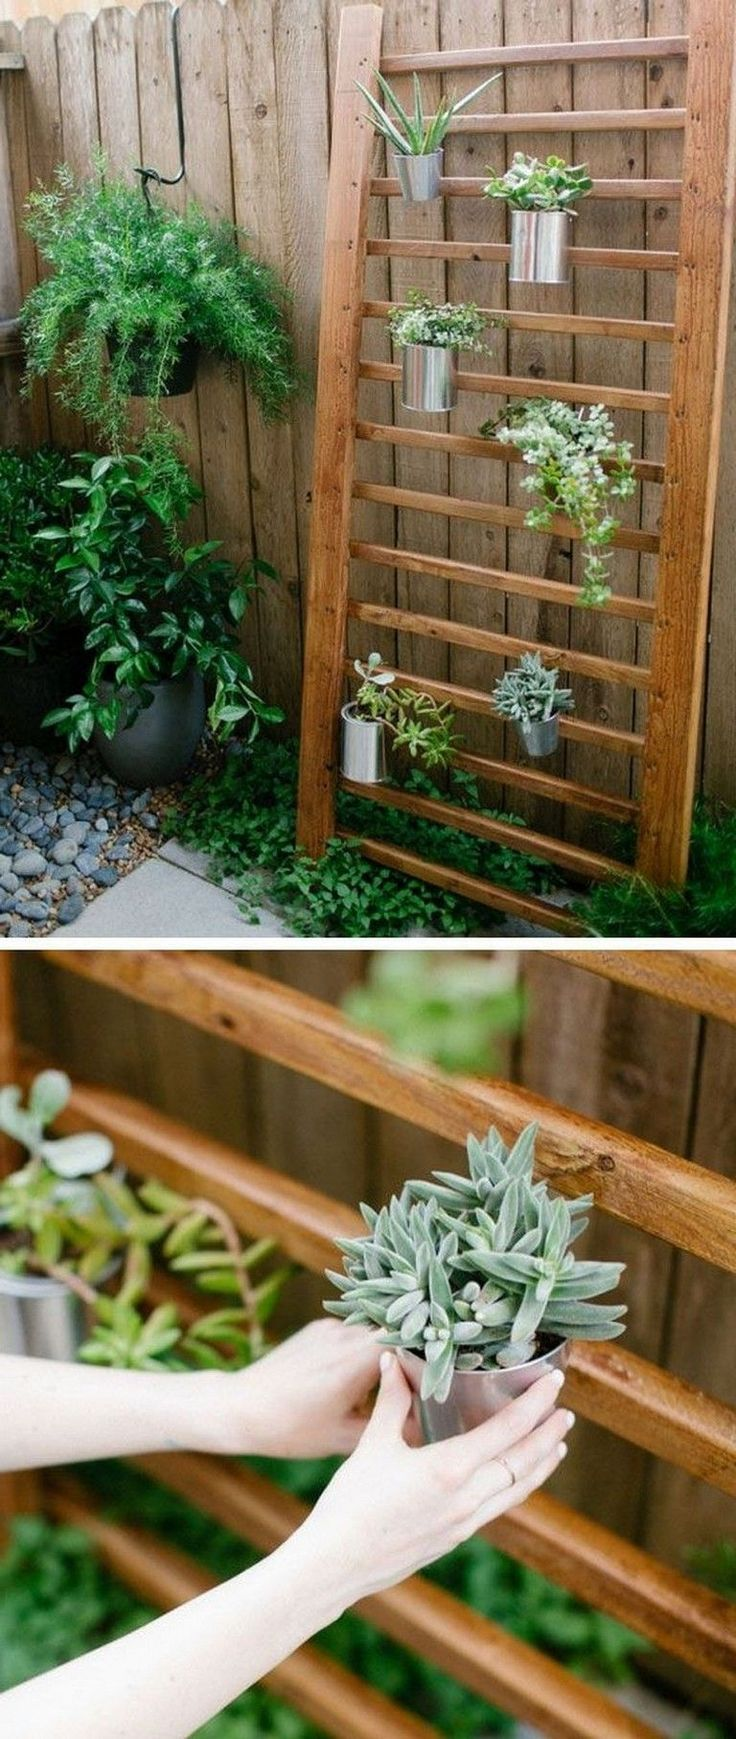 30 Optimum Backyard Design Ideas On A Budget That You Must See – Tropicalpost